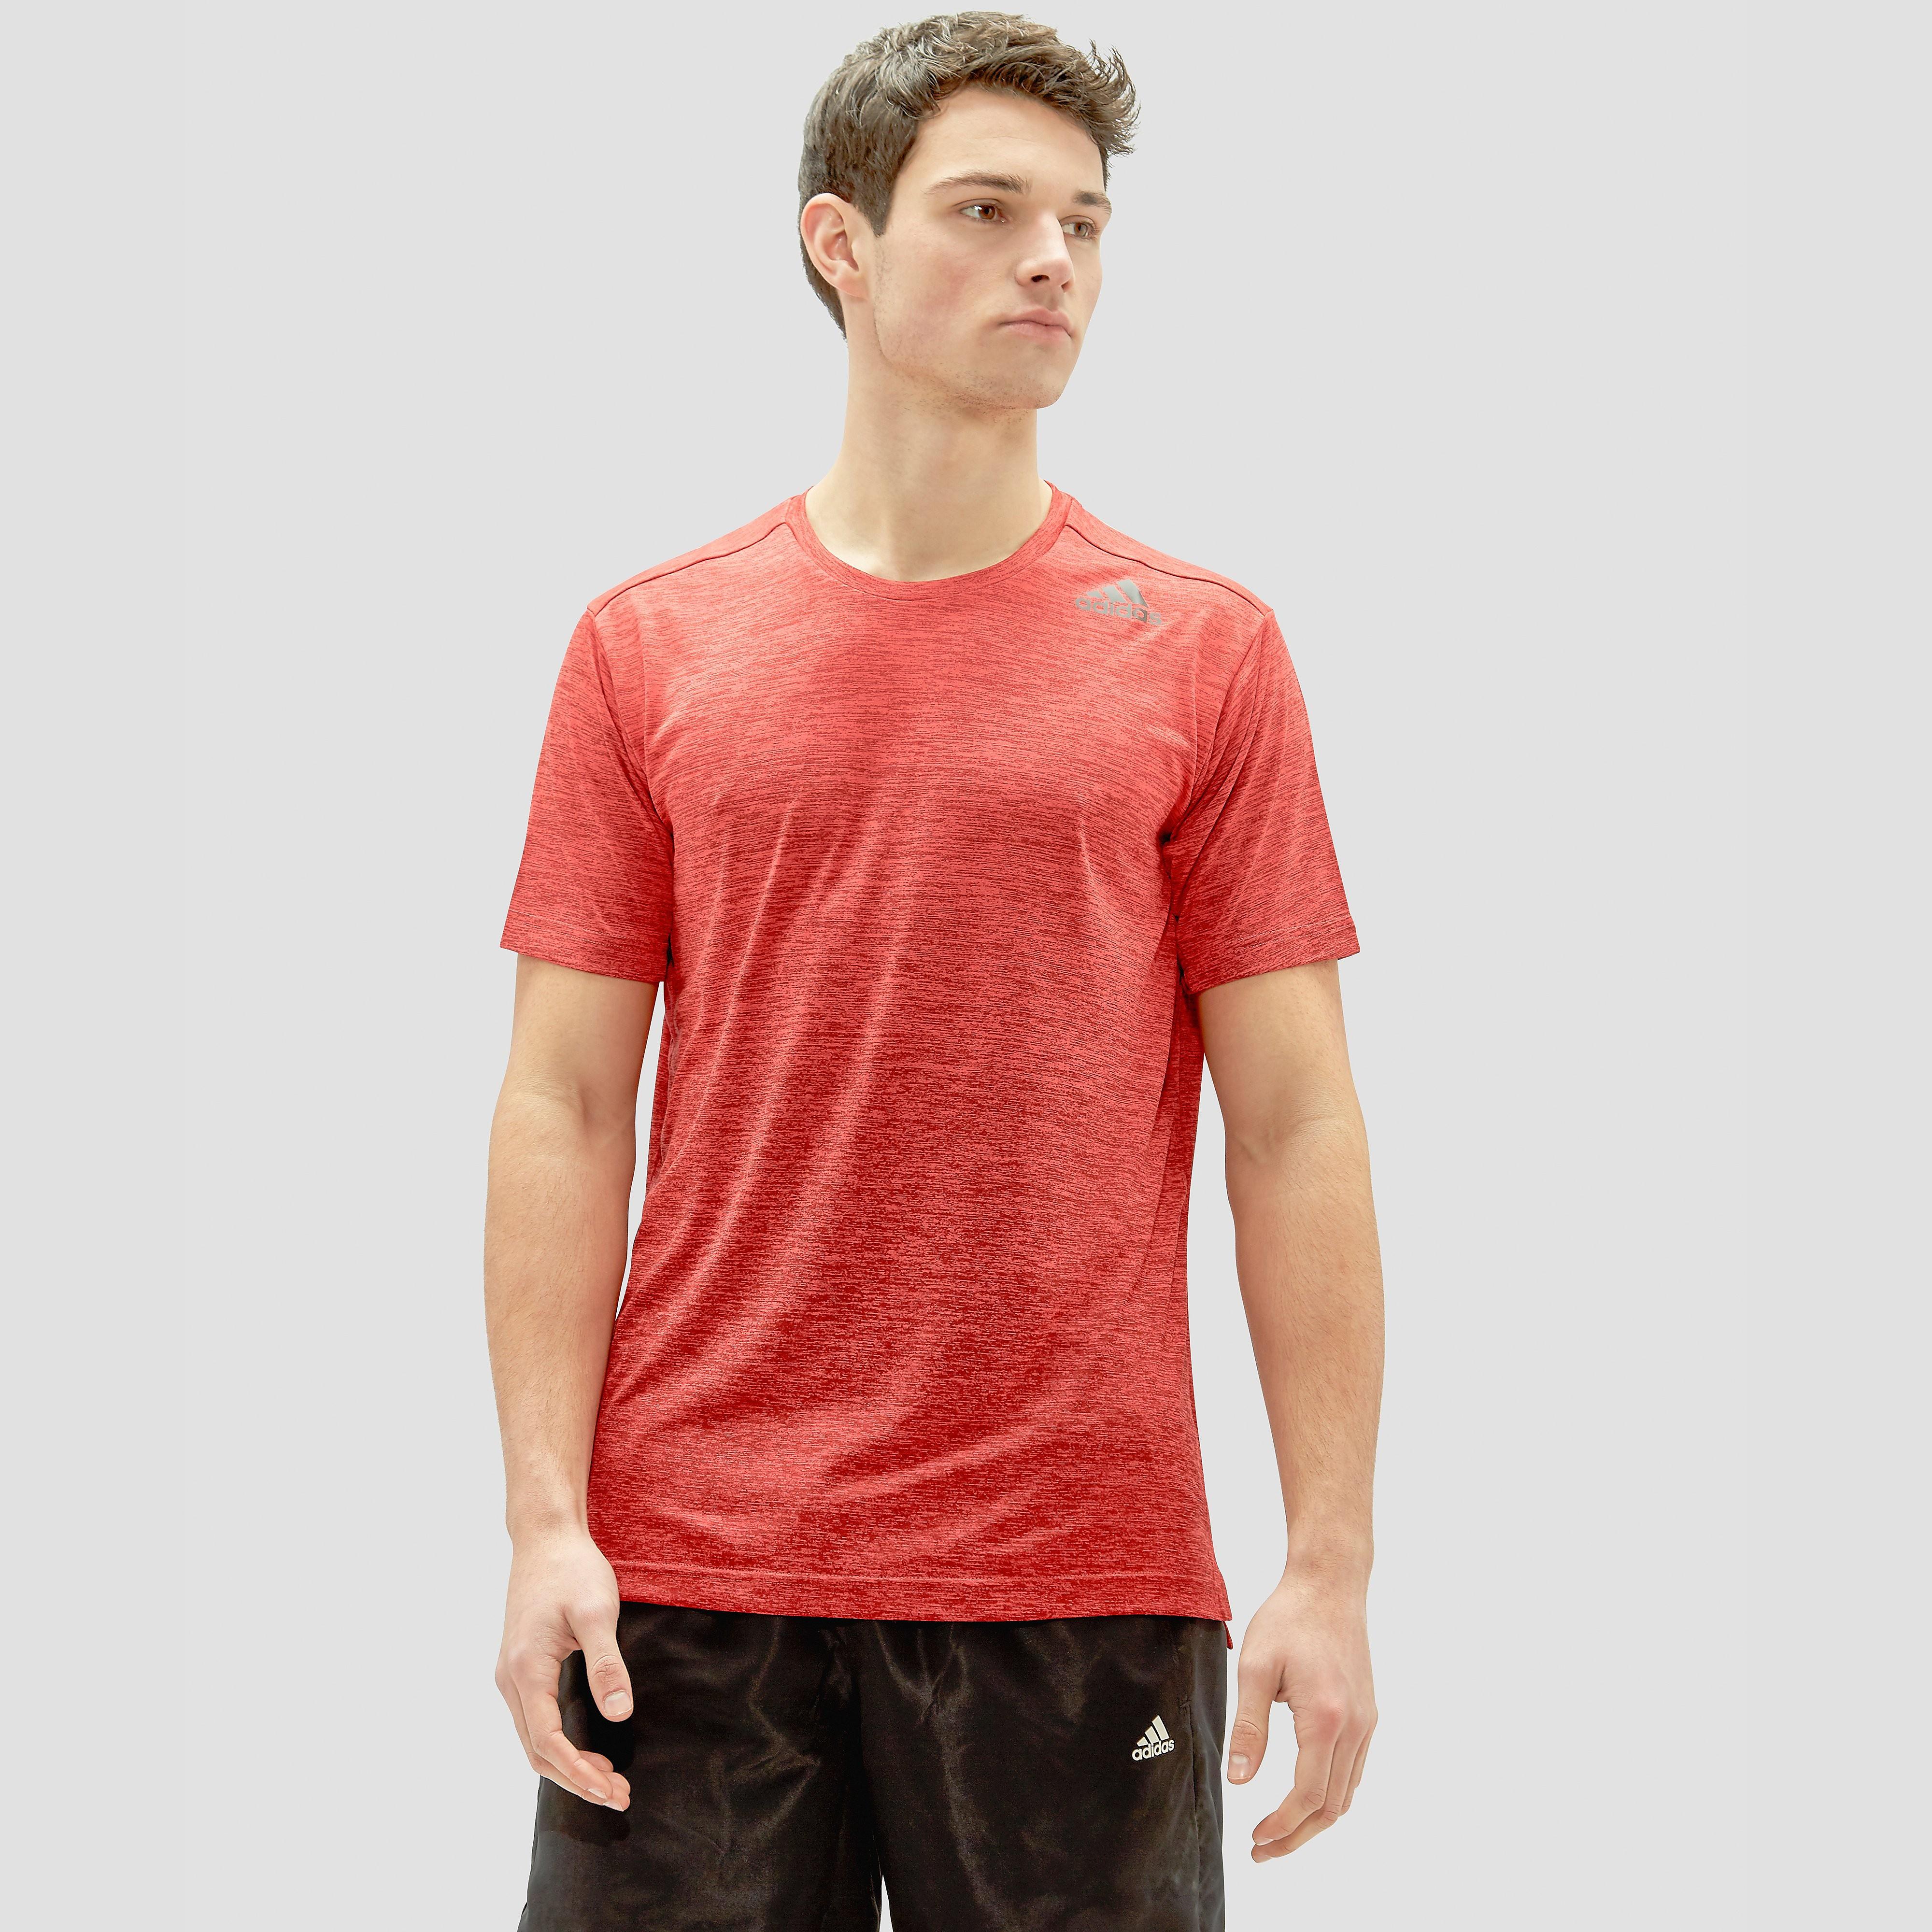 adidas FreeLift Gradient T-shirt, Pink, S, Male, Training